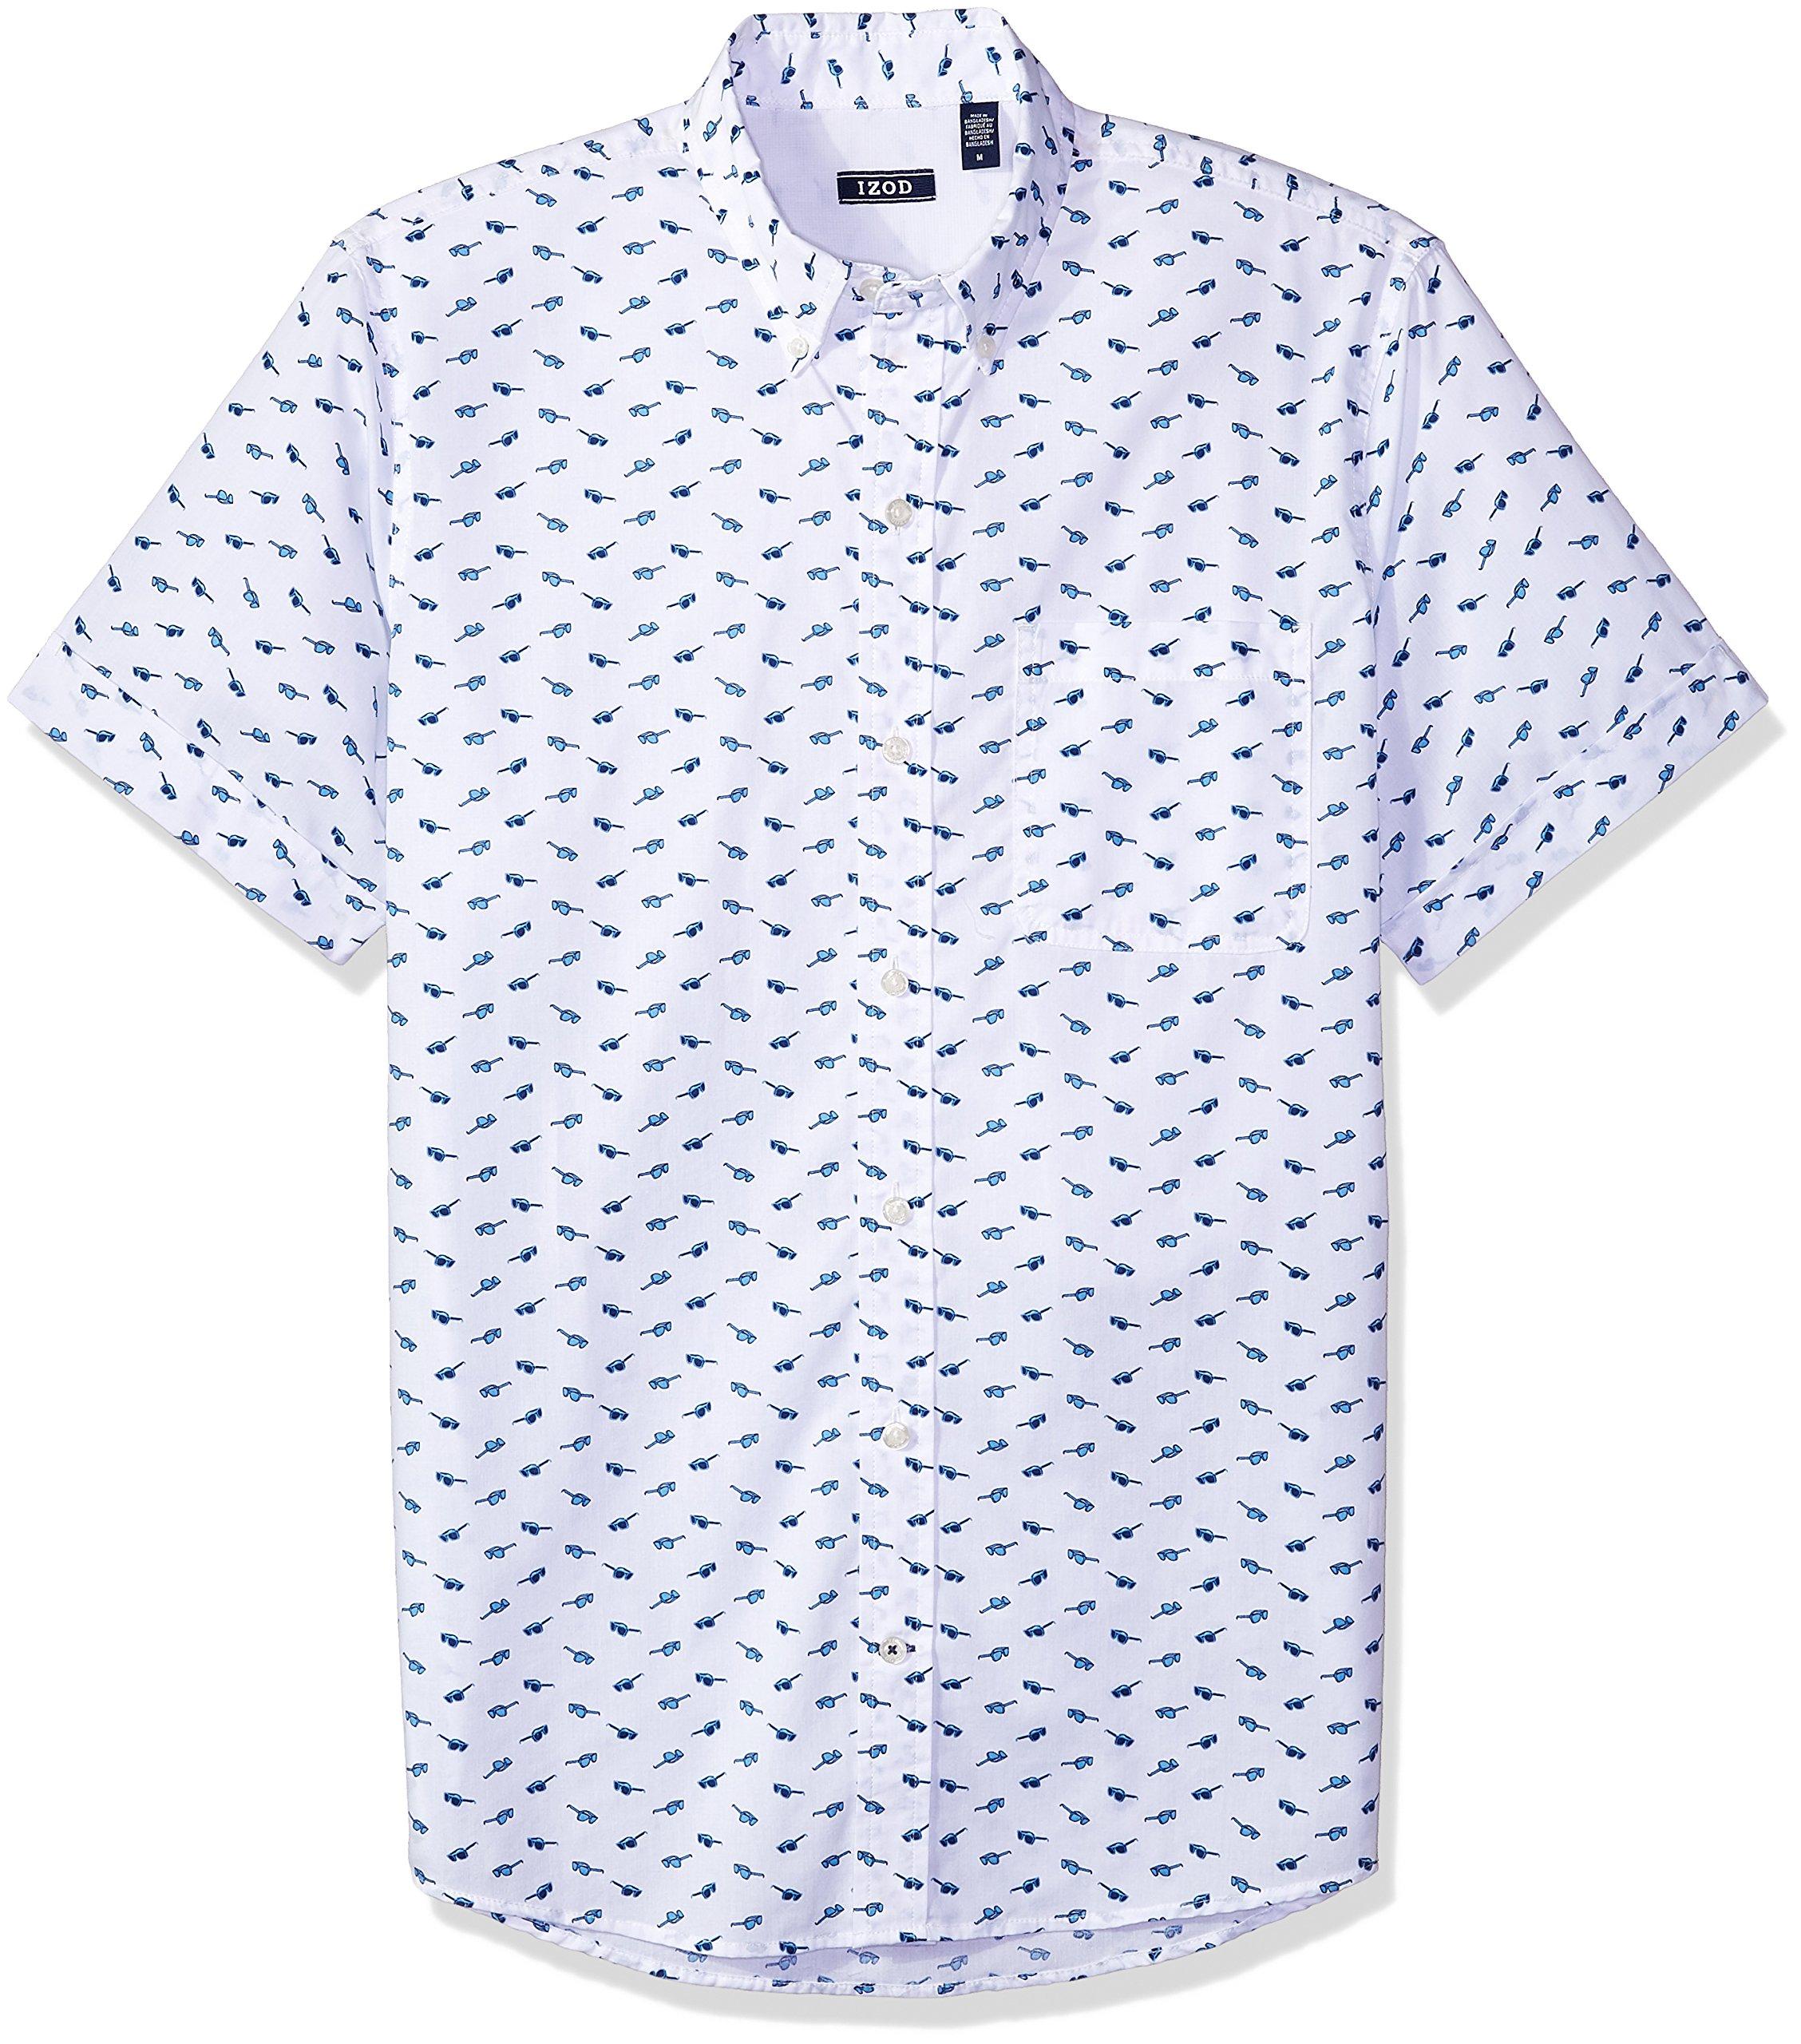 IZOD Men's Advantage Performance Easycare Plaid Short Sleeve Shirt, Glasses White, Medium